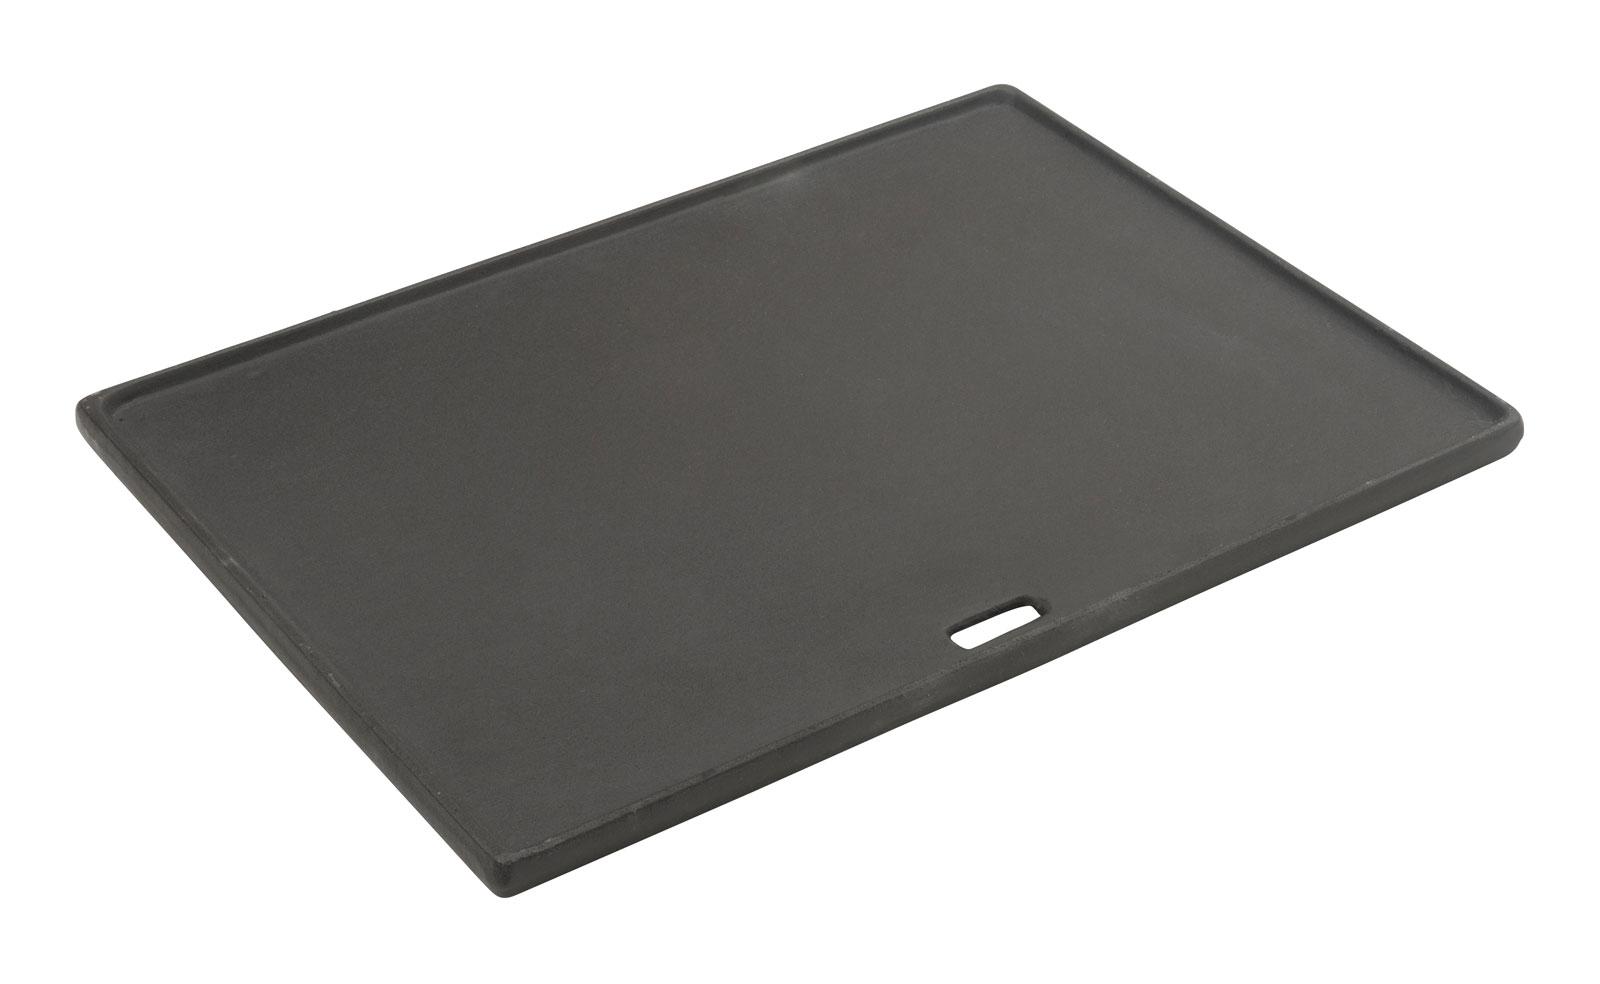 grillplatte f r landmann gasgrill triton 2 0 gusseisen 45x24cm 13191 bei. Black Bedroom Furniture Sets. Home Design Ideas